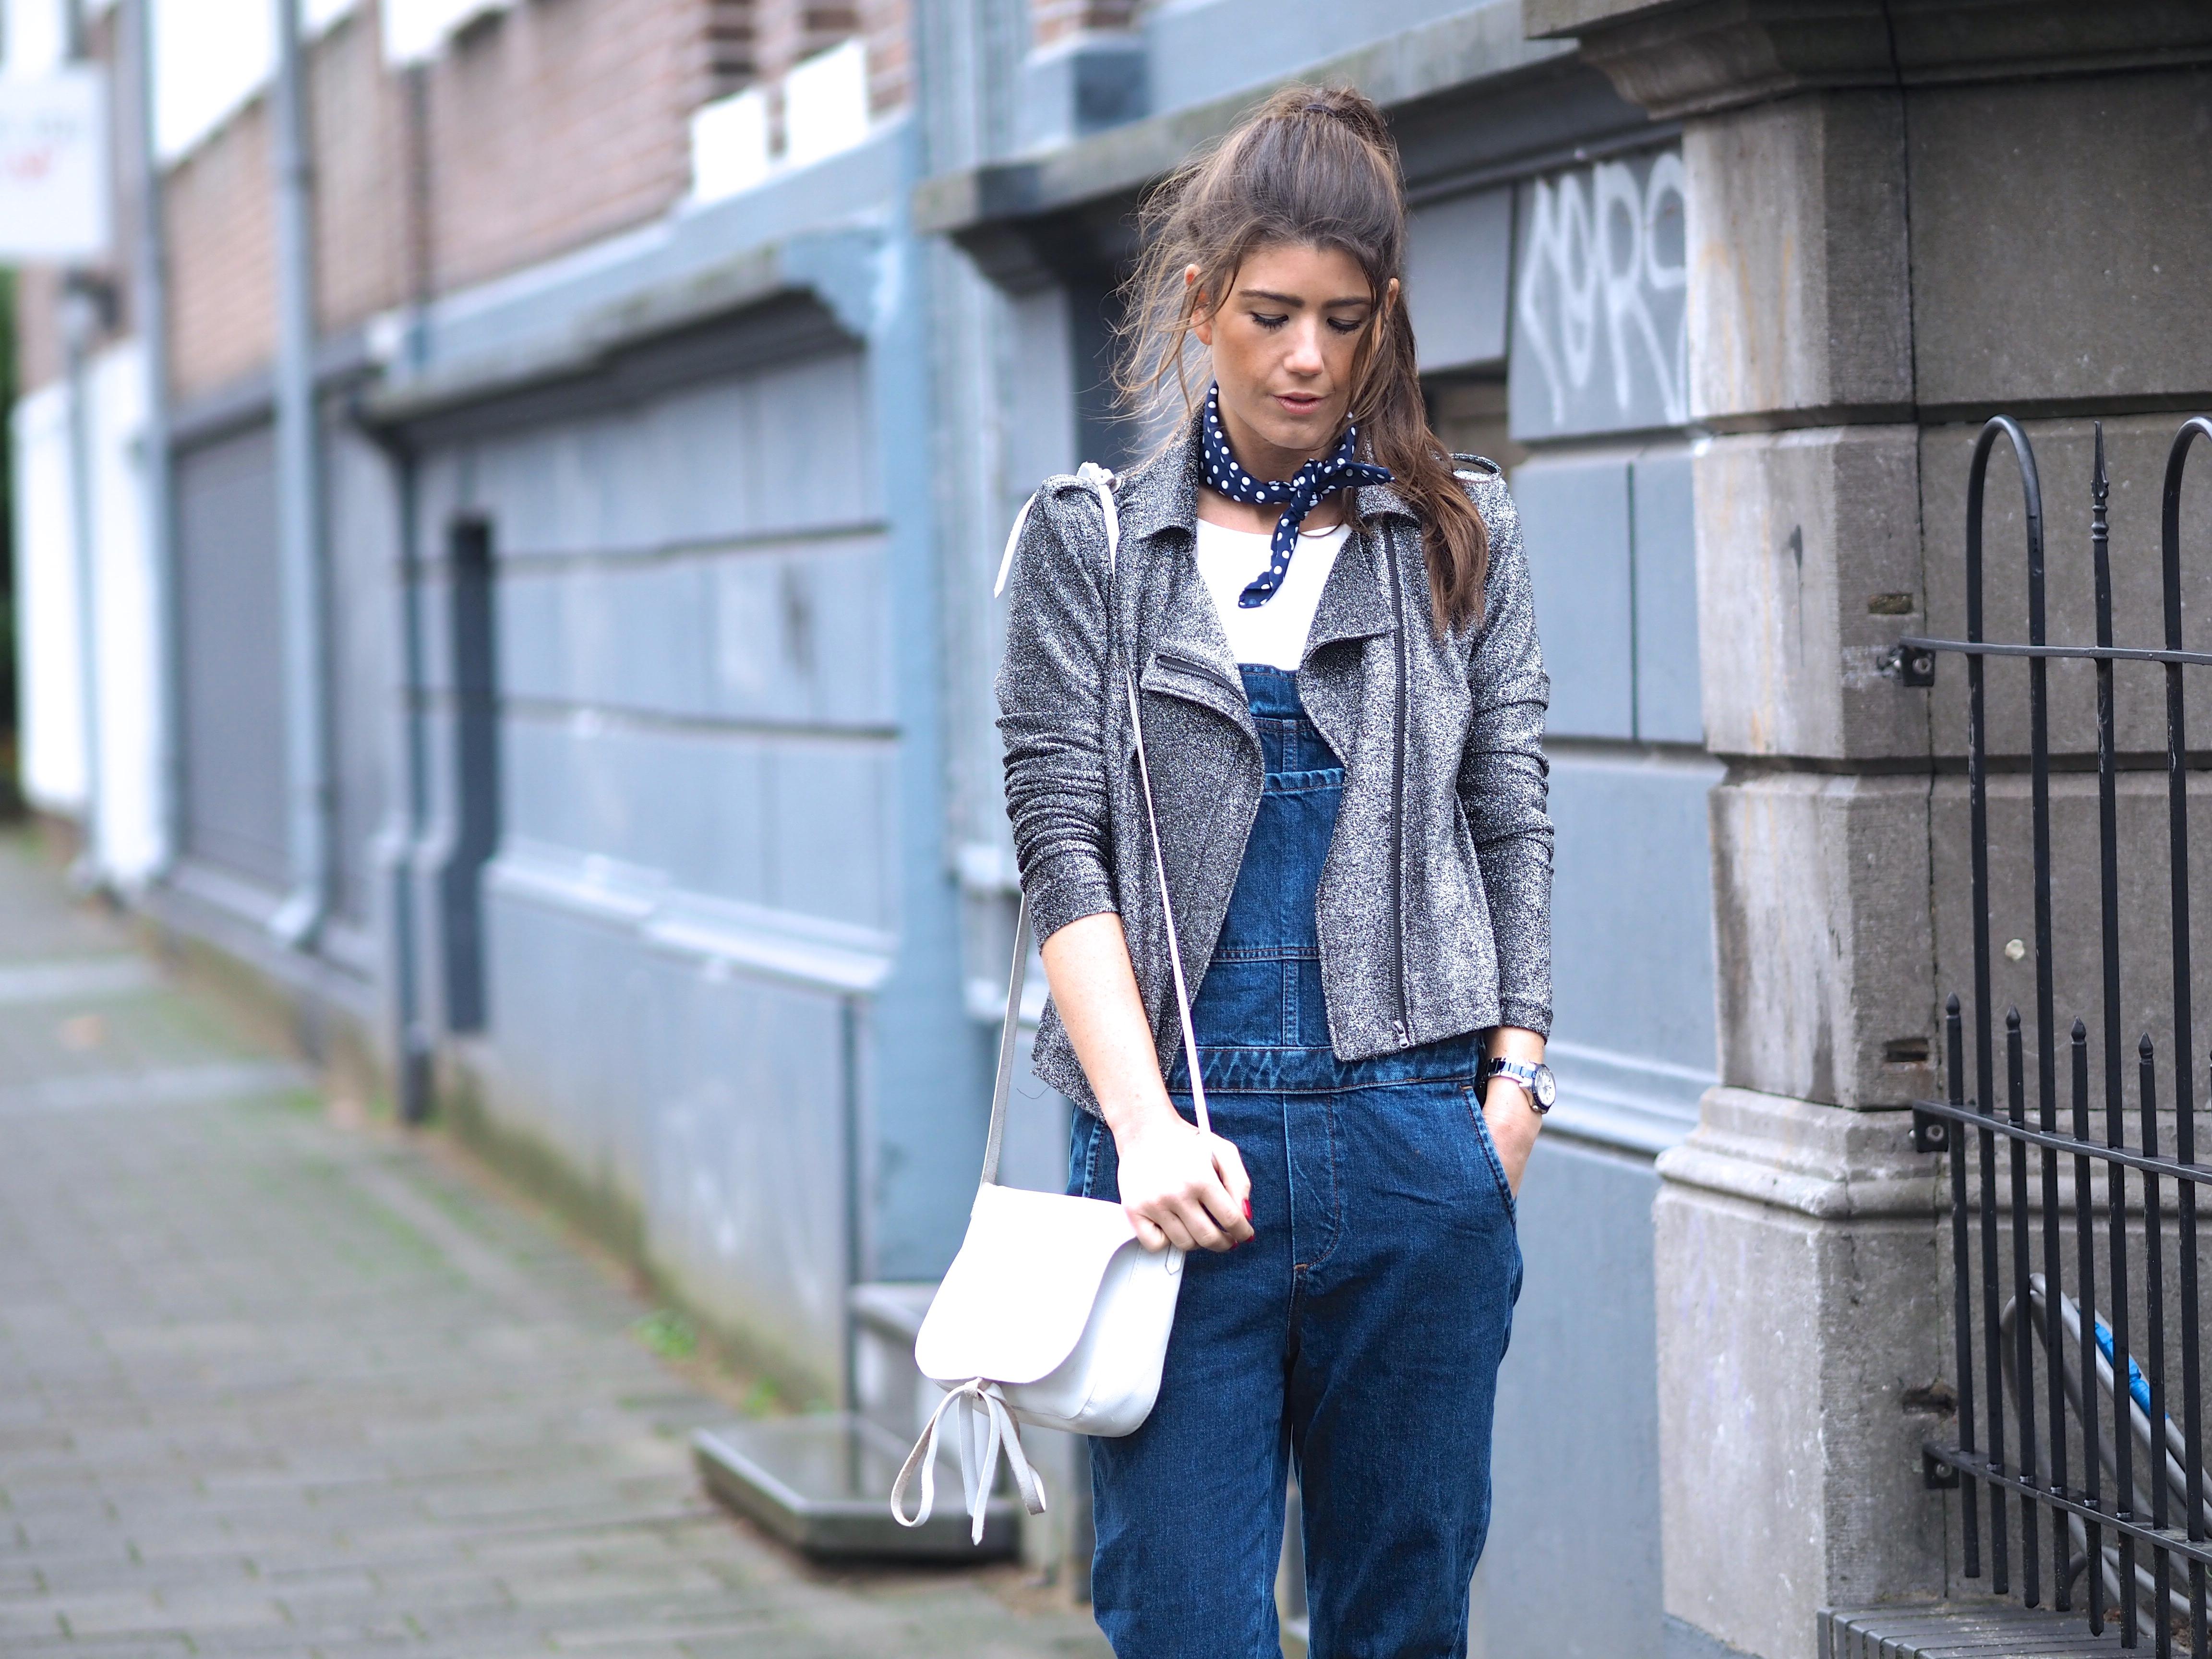 fc4c1d23f86bb THE GLITTER BIKER JACKET. november 18, 2015 door Chloë Sterk 1 · vero moda  otto fashionblogger